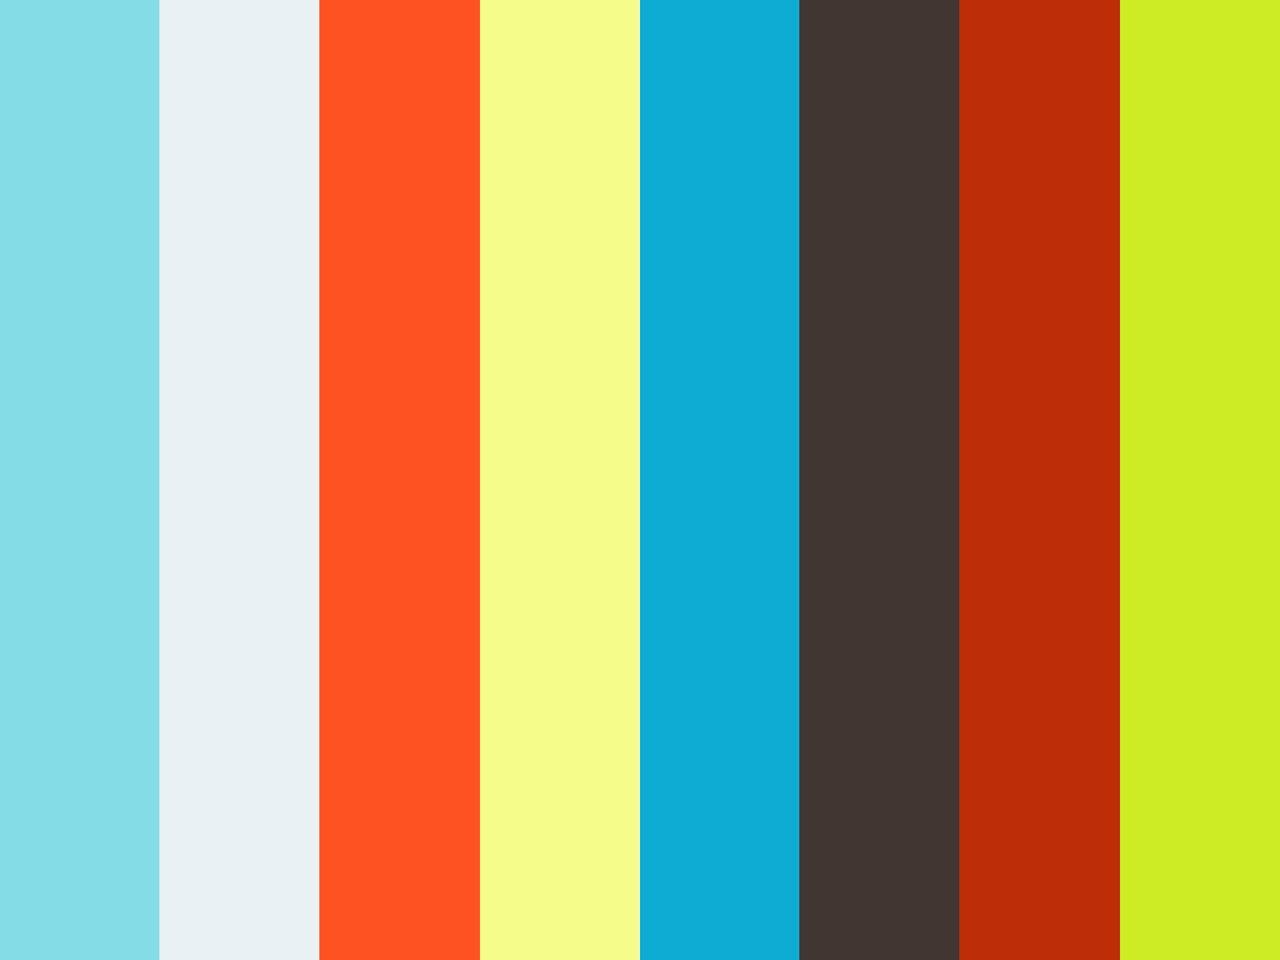 FURUSATO - WUNDE HEIMAT | Thorsten Trimpop Trailer (OmdtU)